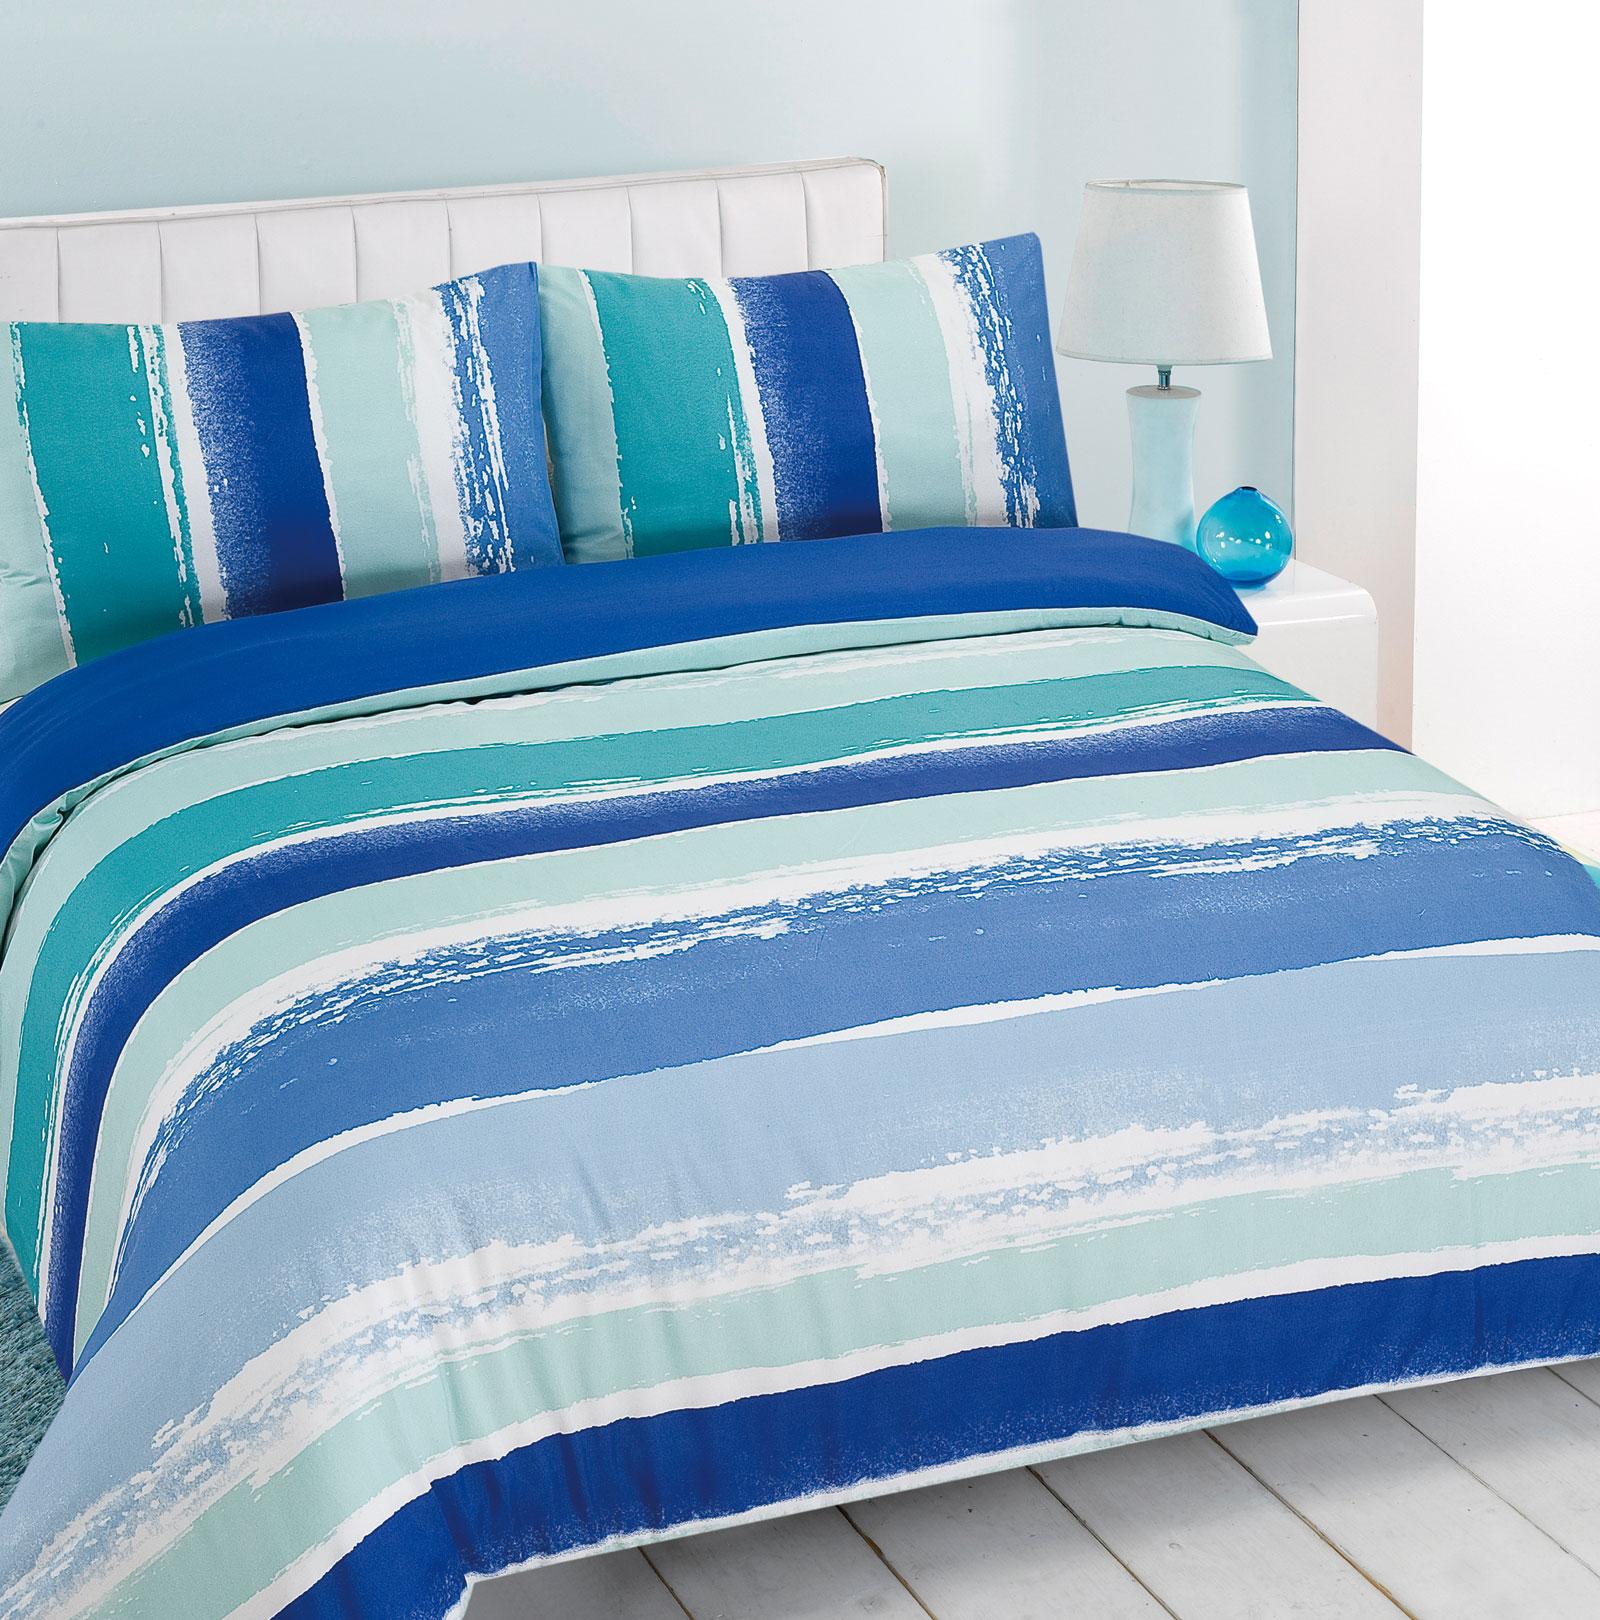 Blue and green striped bedding - Duvet Cover With Pillowcase Portobello Stripe Blue Green